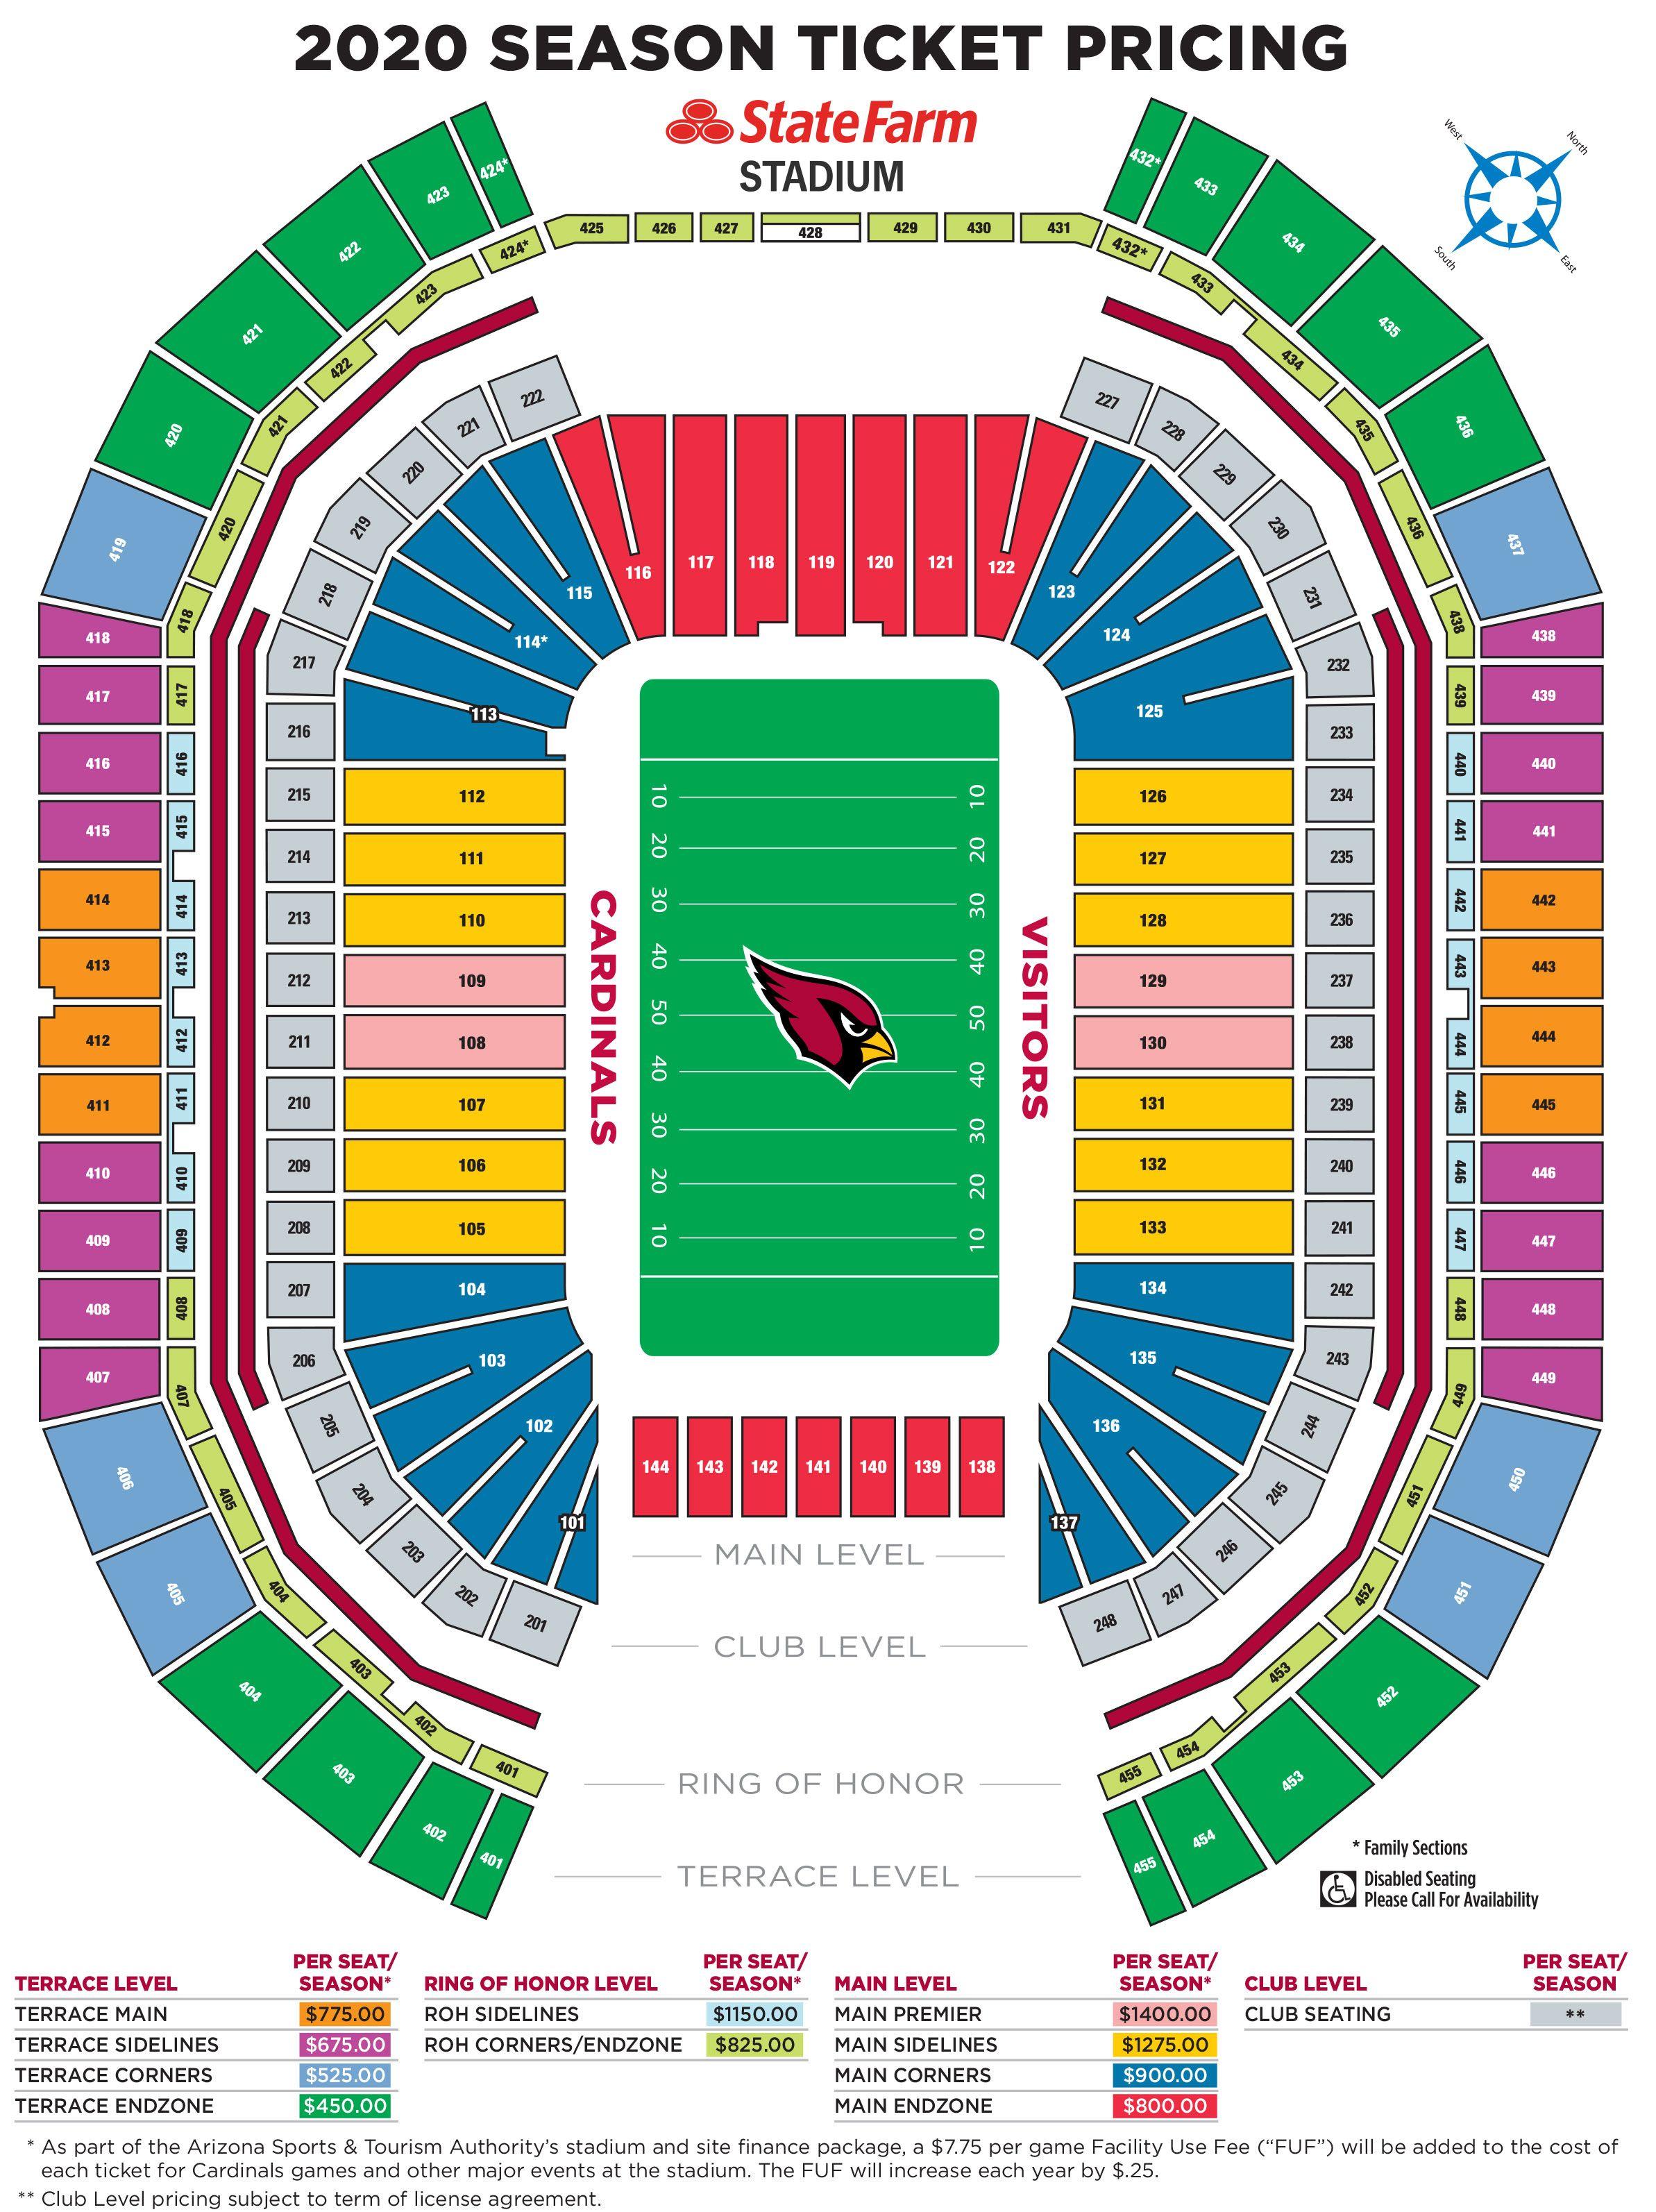 Arizona Cardinals Season Ticket Member Pricing Map Seating Chart Promo Image 050520